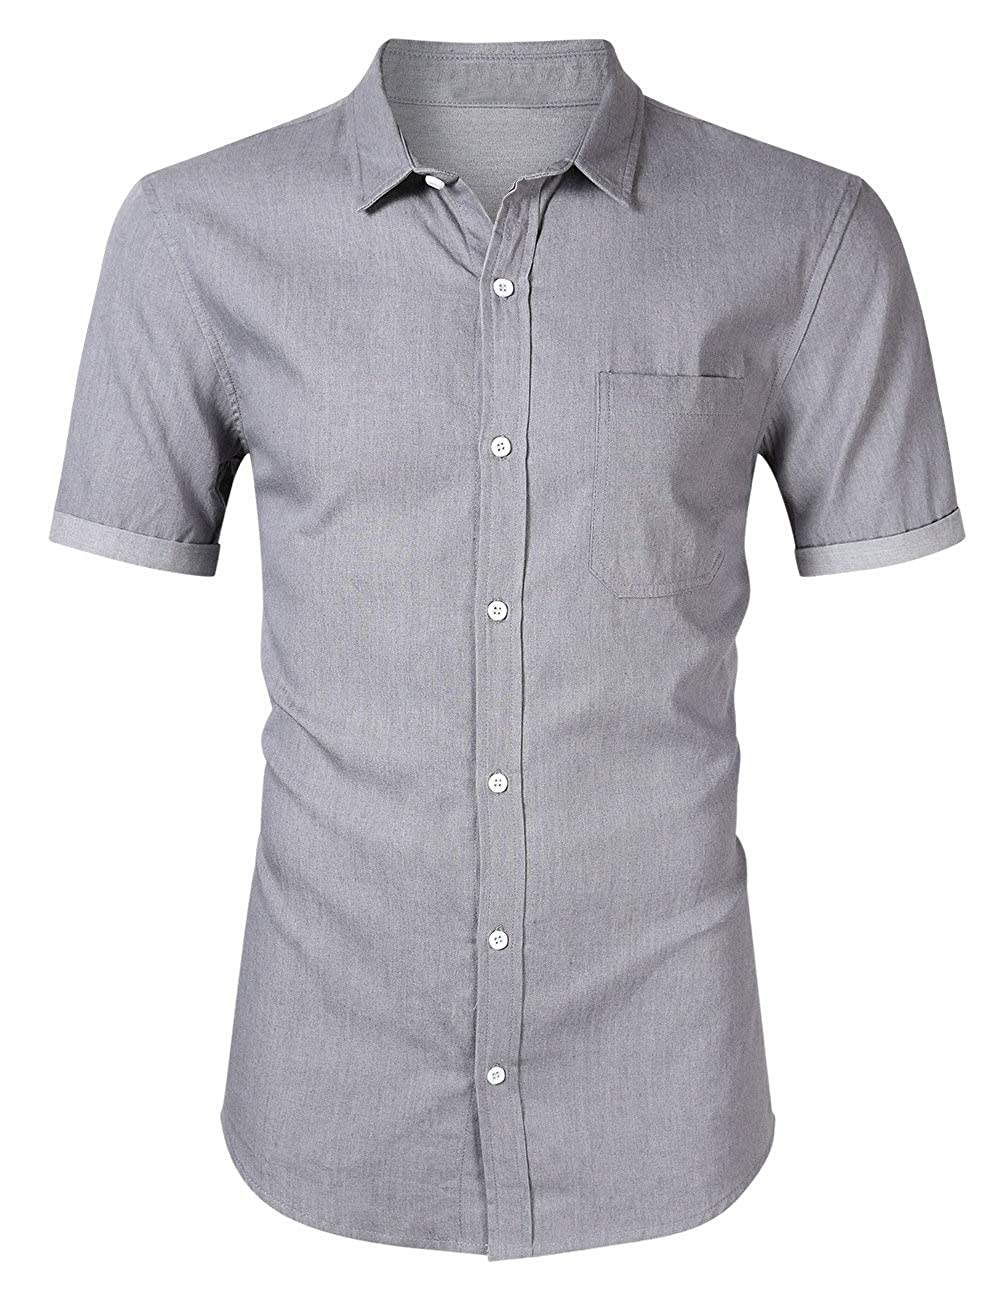 KLJR Men Short Sleeve Denim Lapel Casual Button Front Shirt Blouse Top